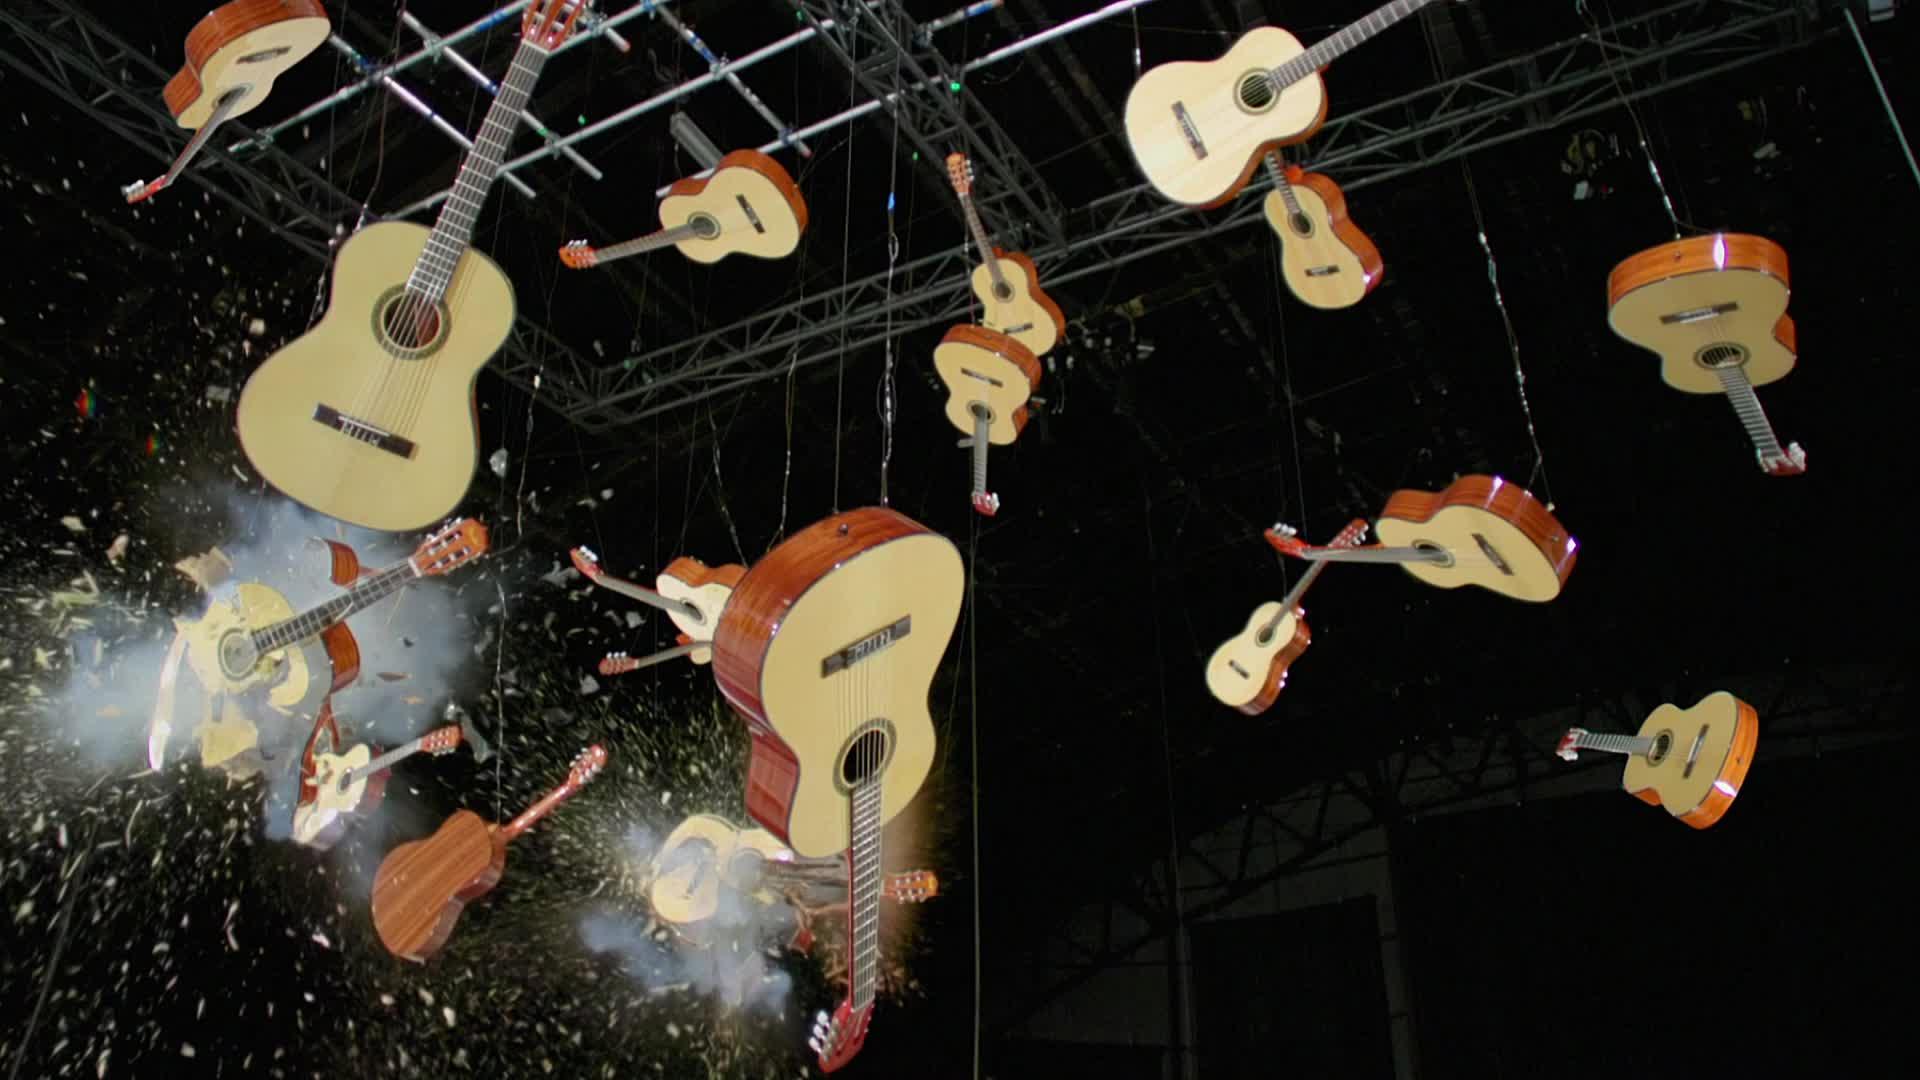 OK Go, The One Moment, moment, morton, music, okgo, one, theonemoment, Explosive Acoustic Guitars - OK Go GIFs